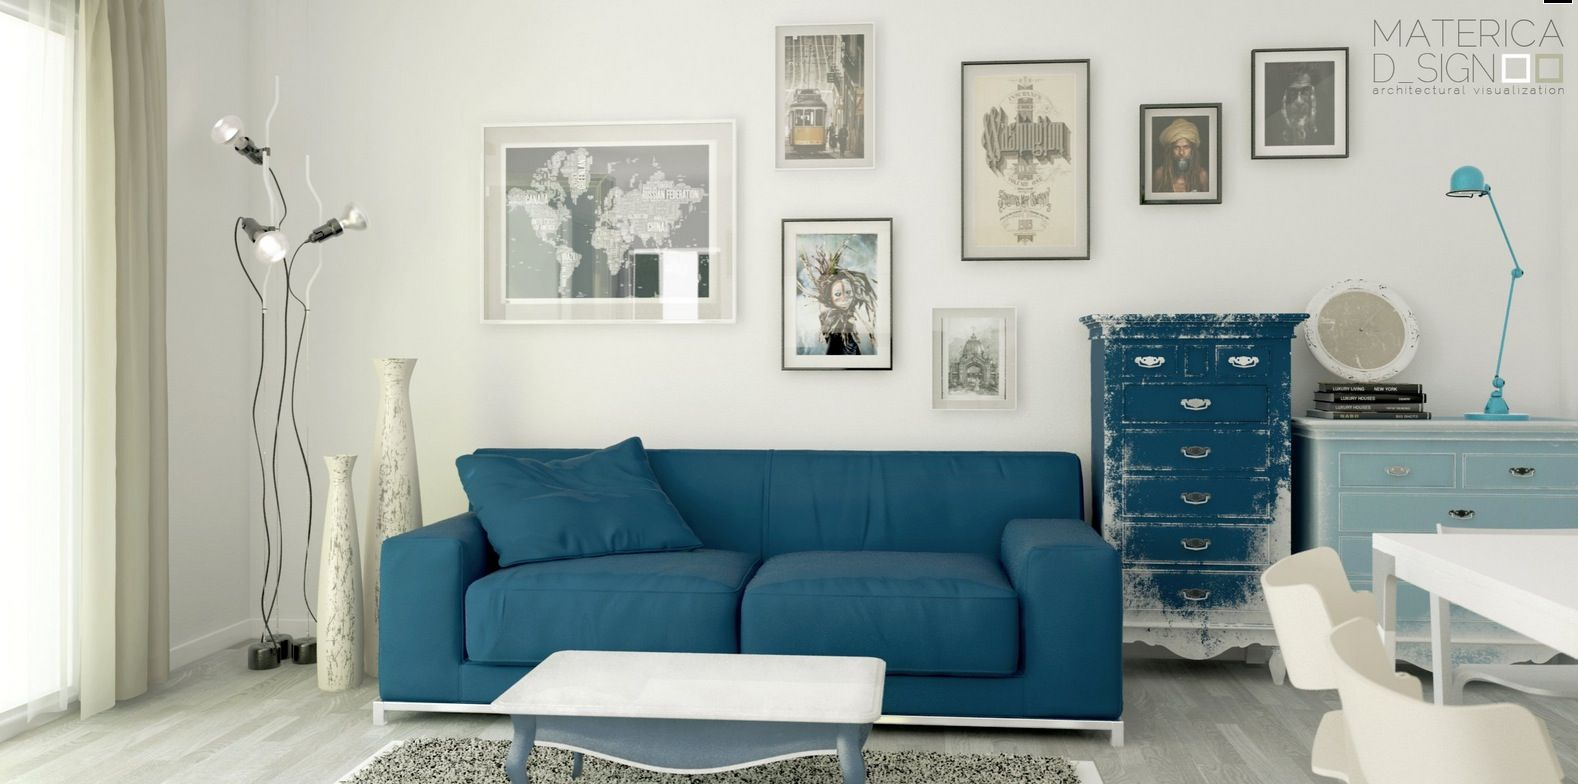 Blue Sofa Living Room Design Admirable Blue Sofa Designs For Fascinating Living Room  Catchy